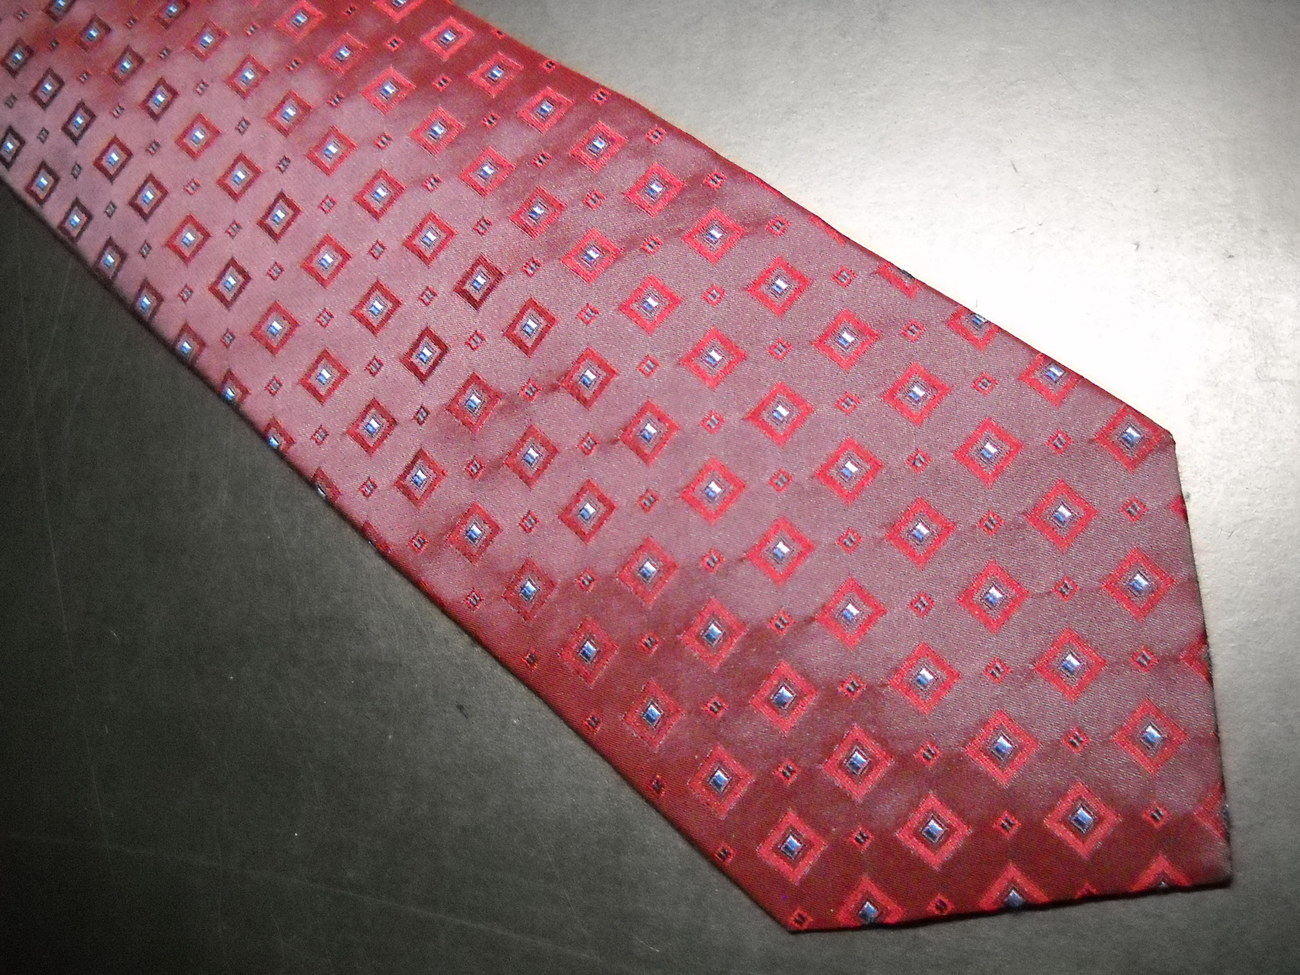 Valerio Garati Neck Tie Silk Hand Made Bright Reds Maroons and Blues image 2